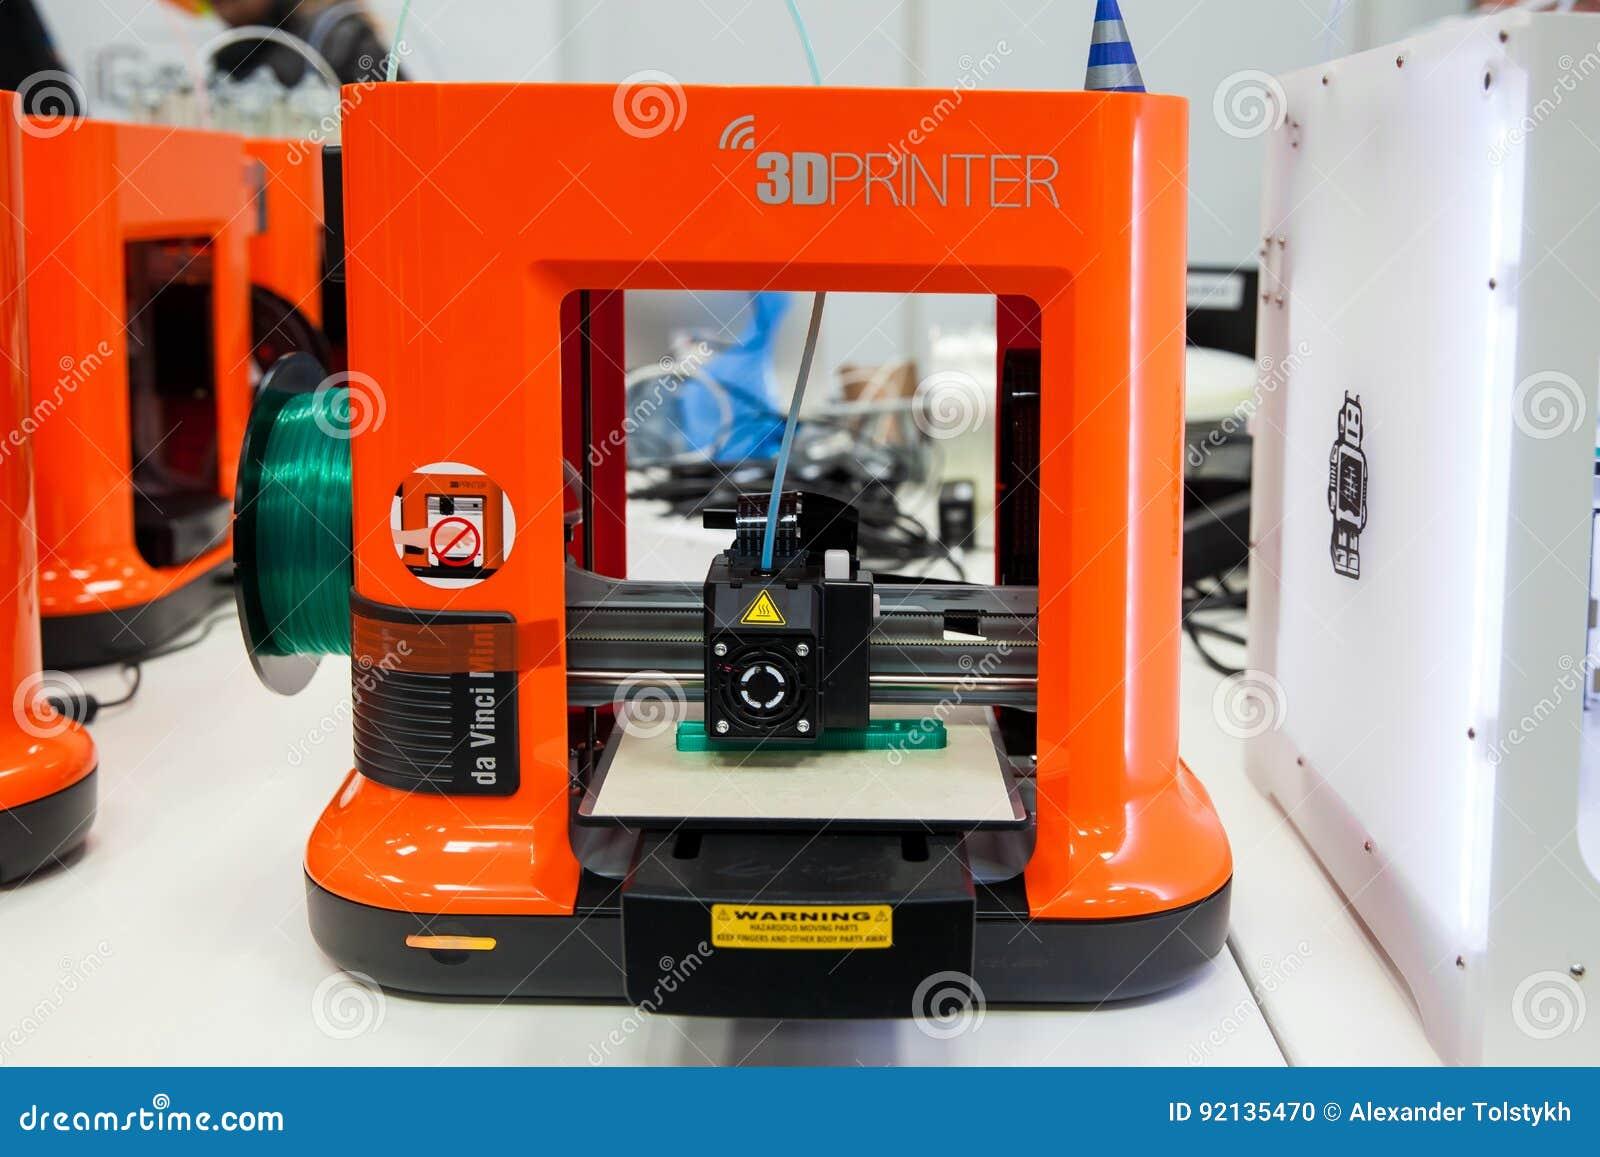 D Printer Exhibition Germany : D printer da vinchi mini printing close up process on exhibition